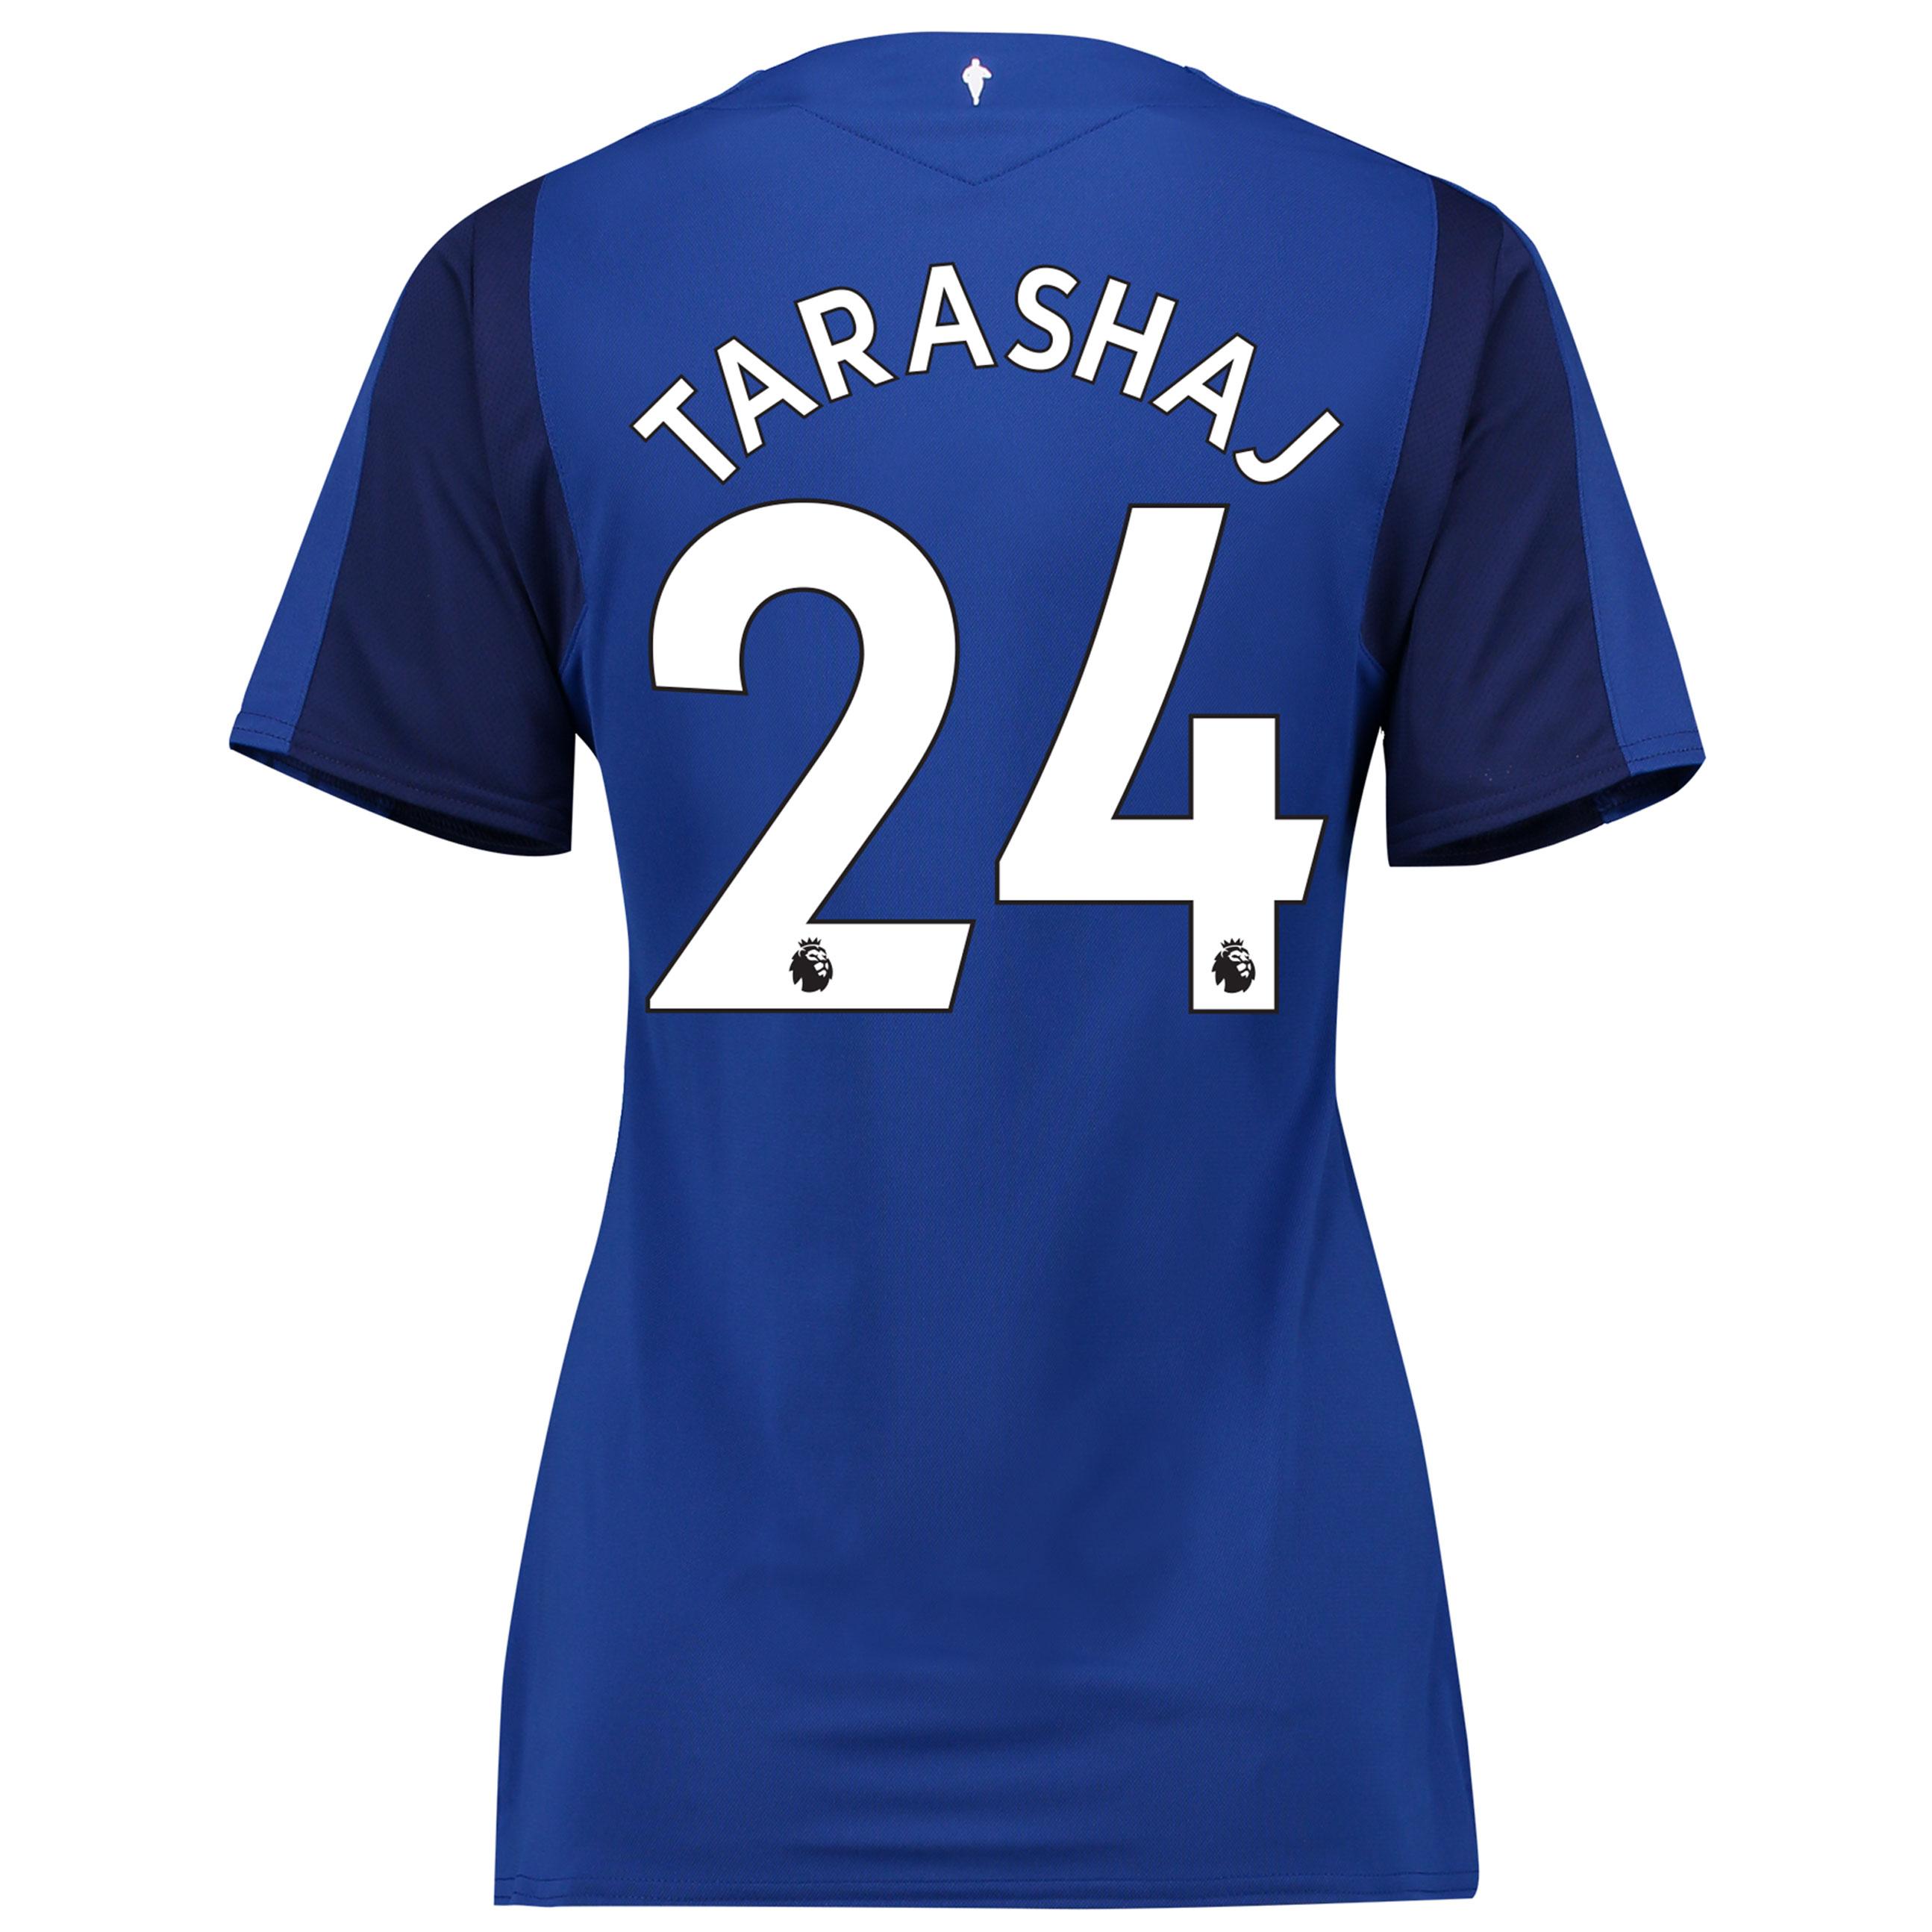 Everton Home Shirt 2017/18 - Womens with Tarashaj 24 printing